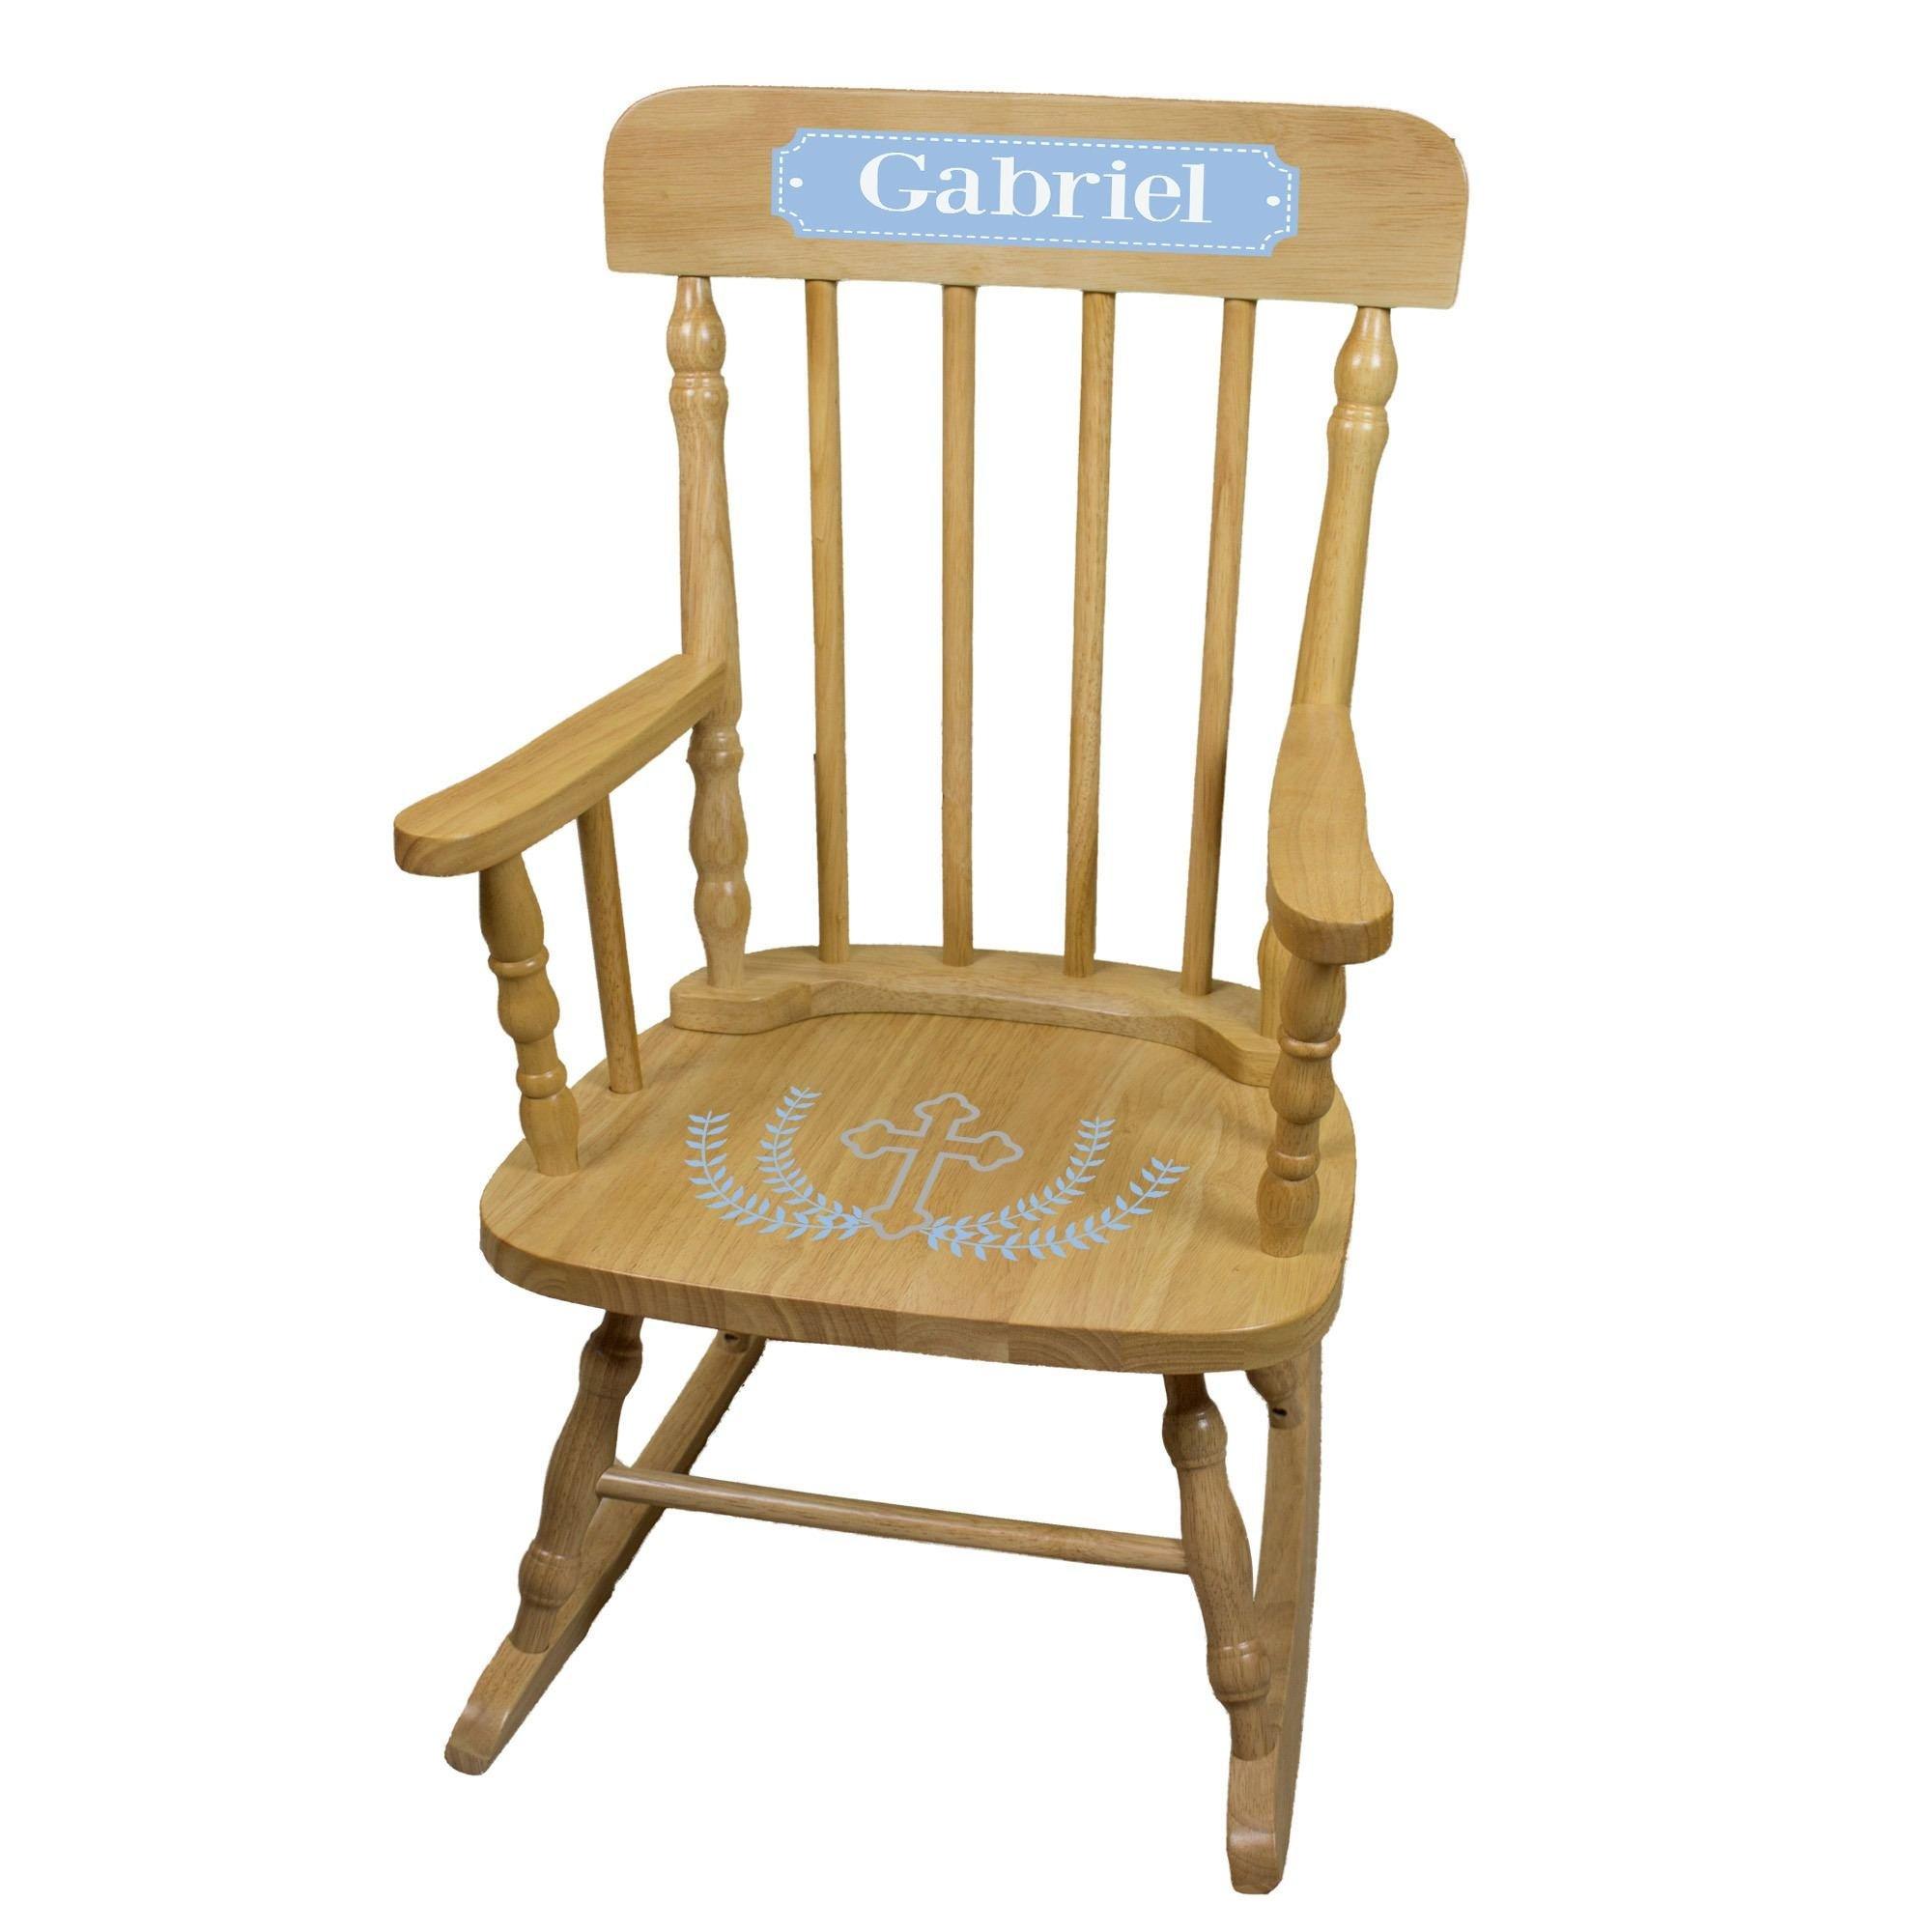 MyBambino Personalized Cross Garland Light blue Natural Wooden Childrens Rocking Chair